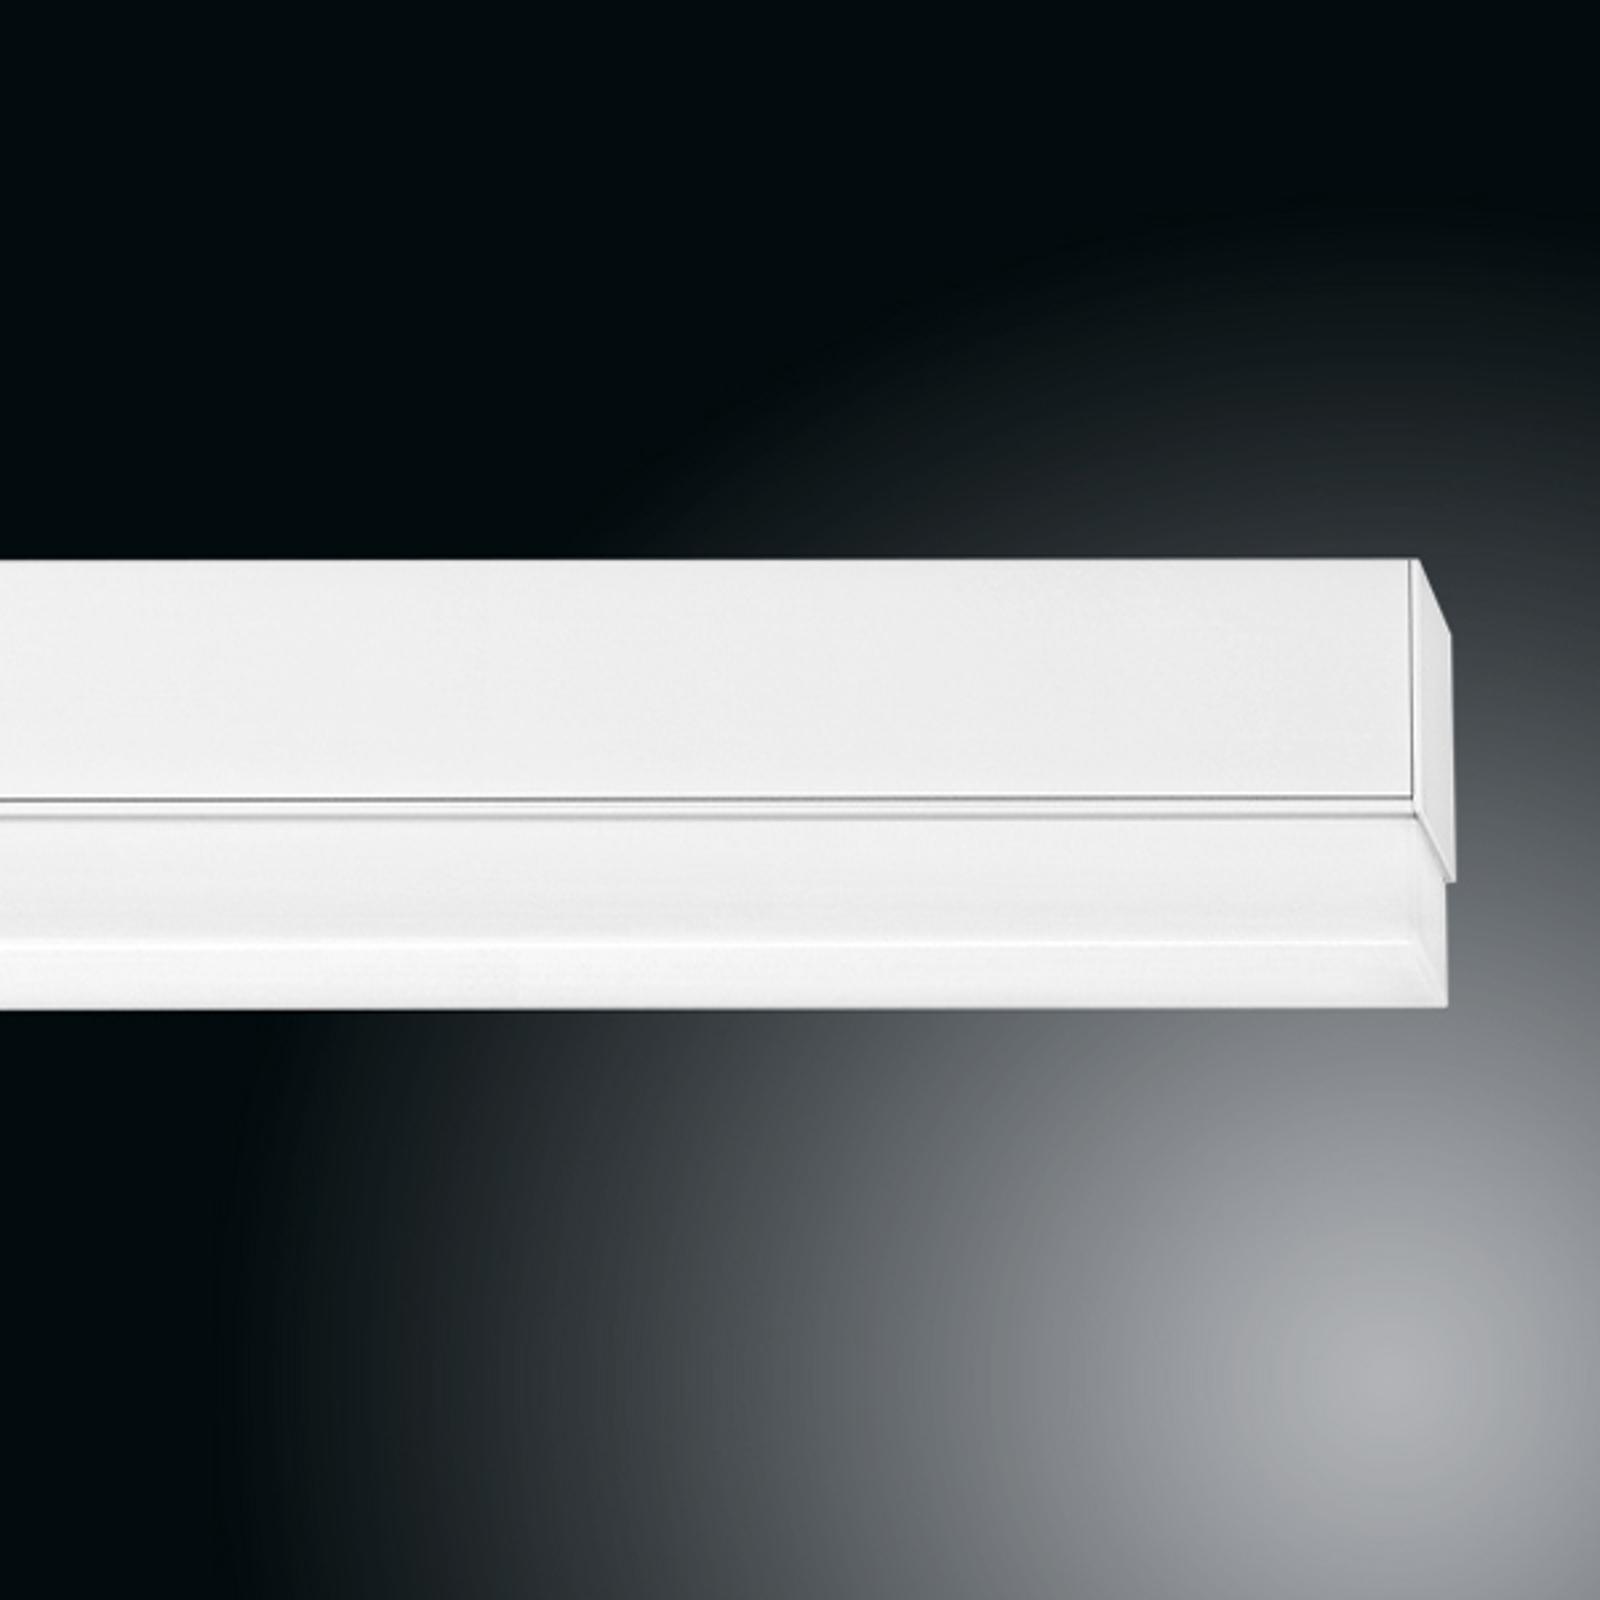 Ribag Metron LED-Deckenlampe ww dimmbar 60cm